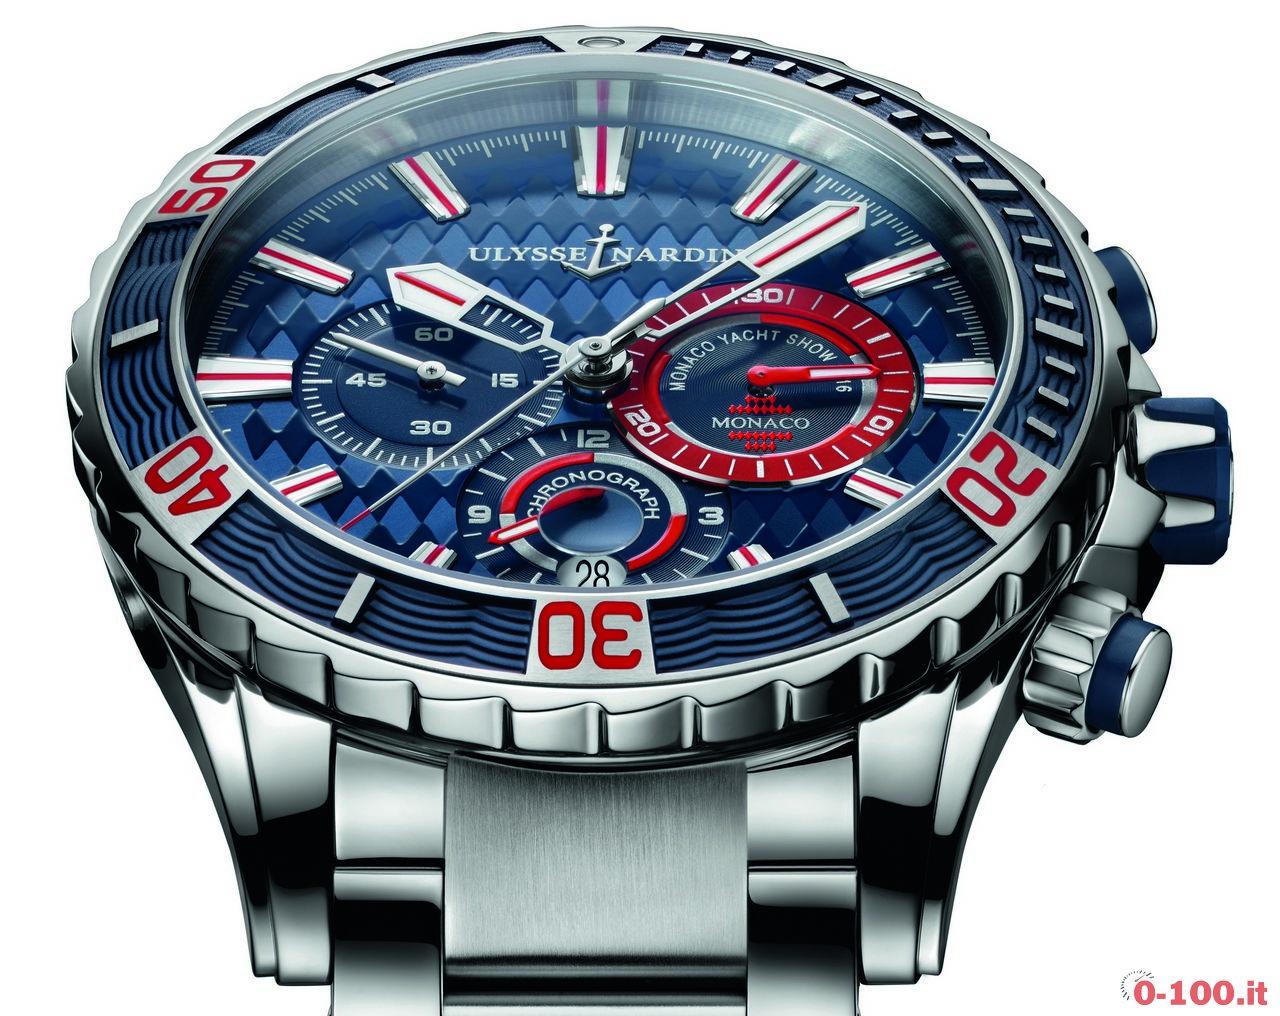 ulysse-nardin-diver-chronograph-monaco-ref-1503-1_0-1001